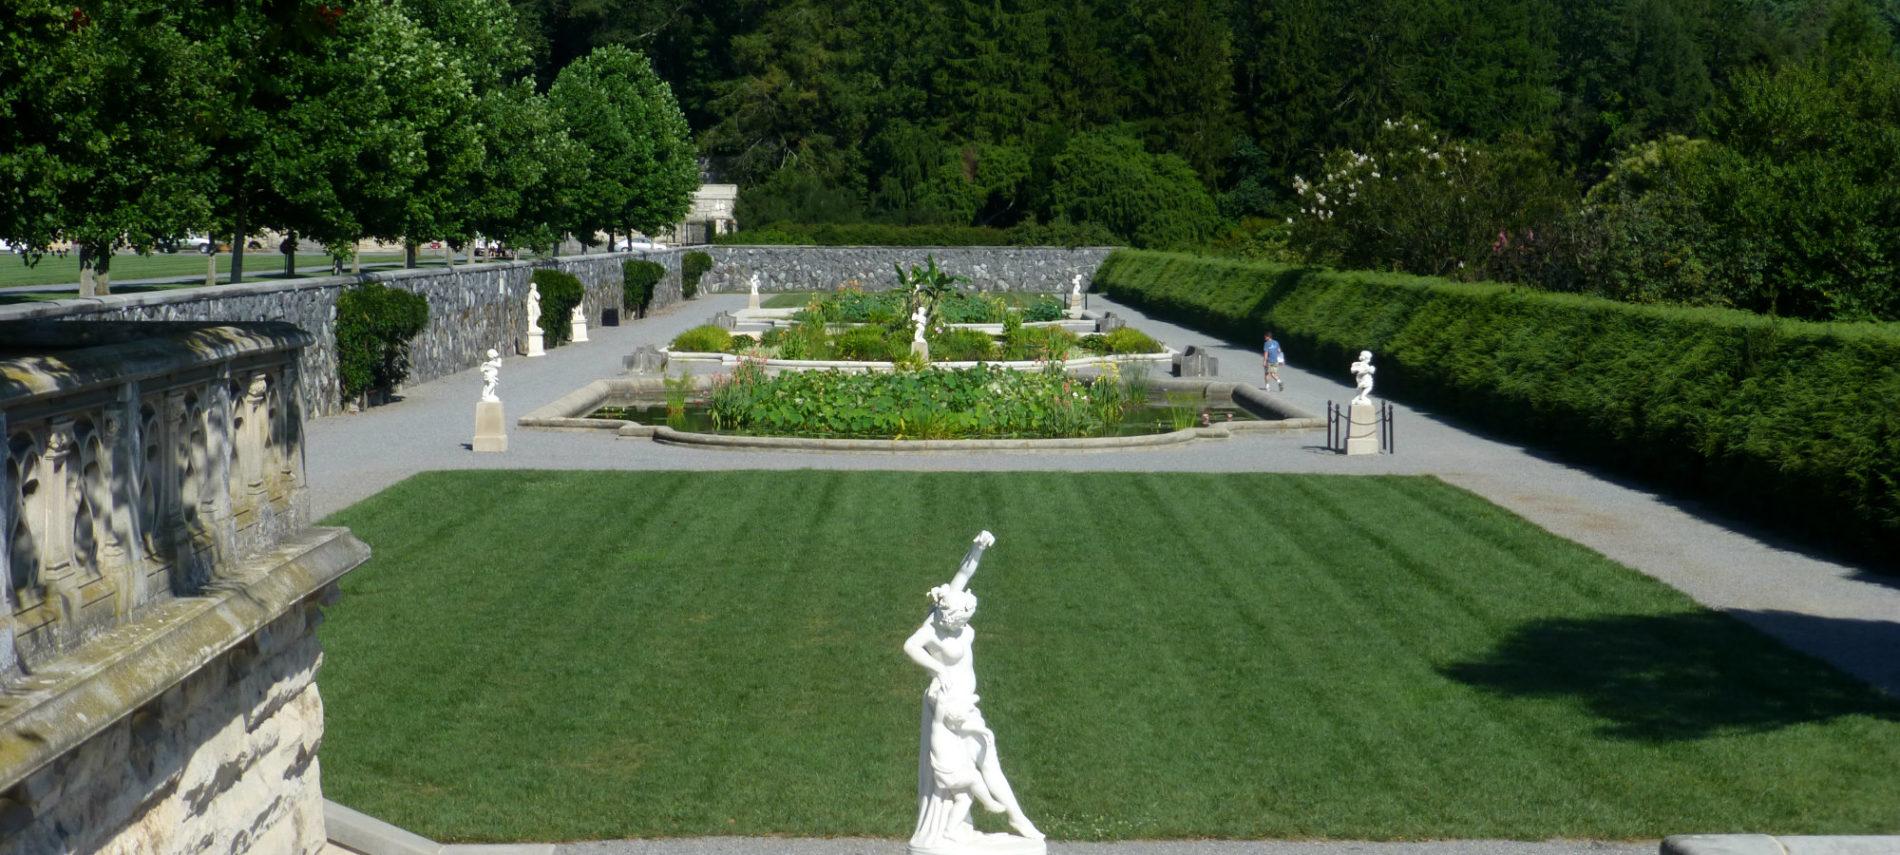 The Italian Garden At Biltmore Estate In Asheville